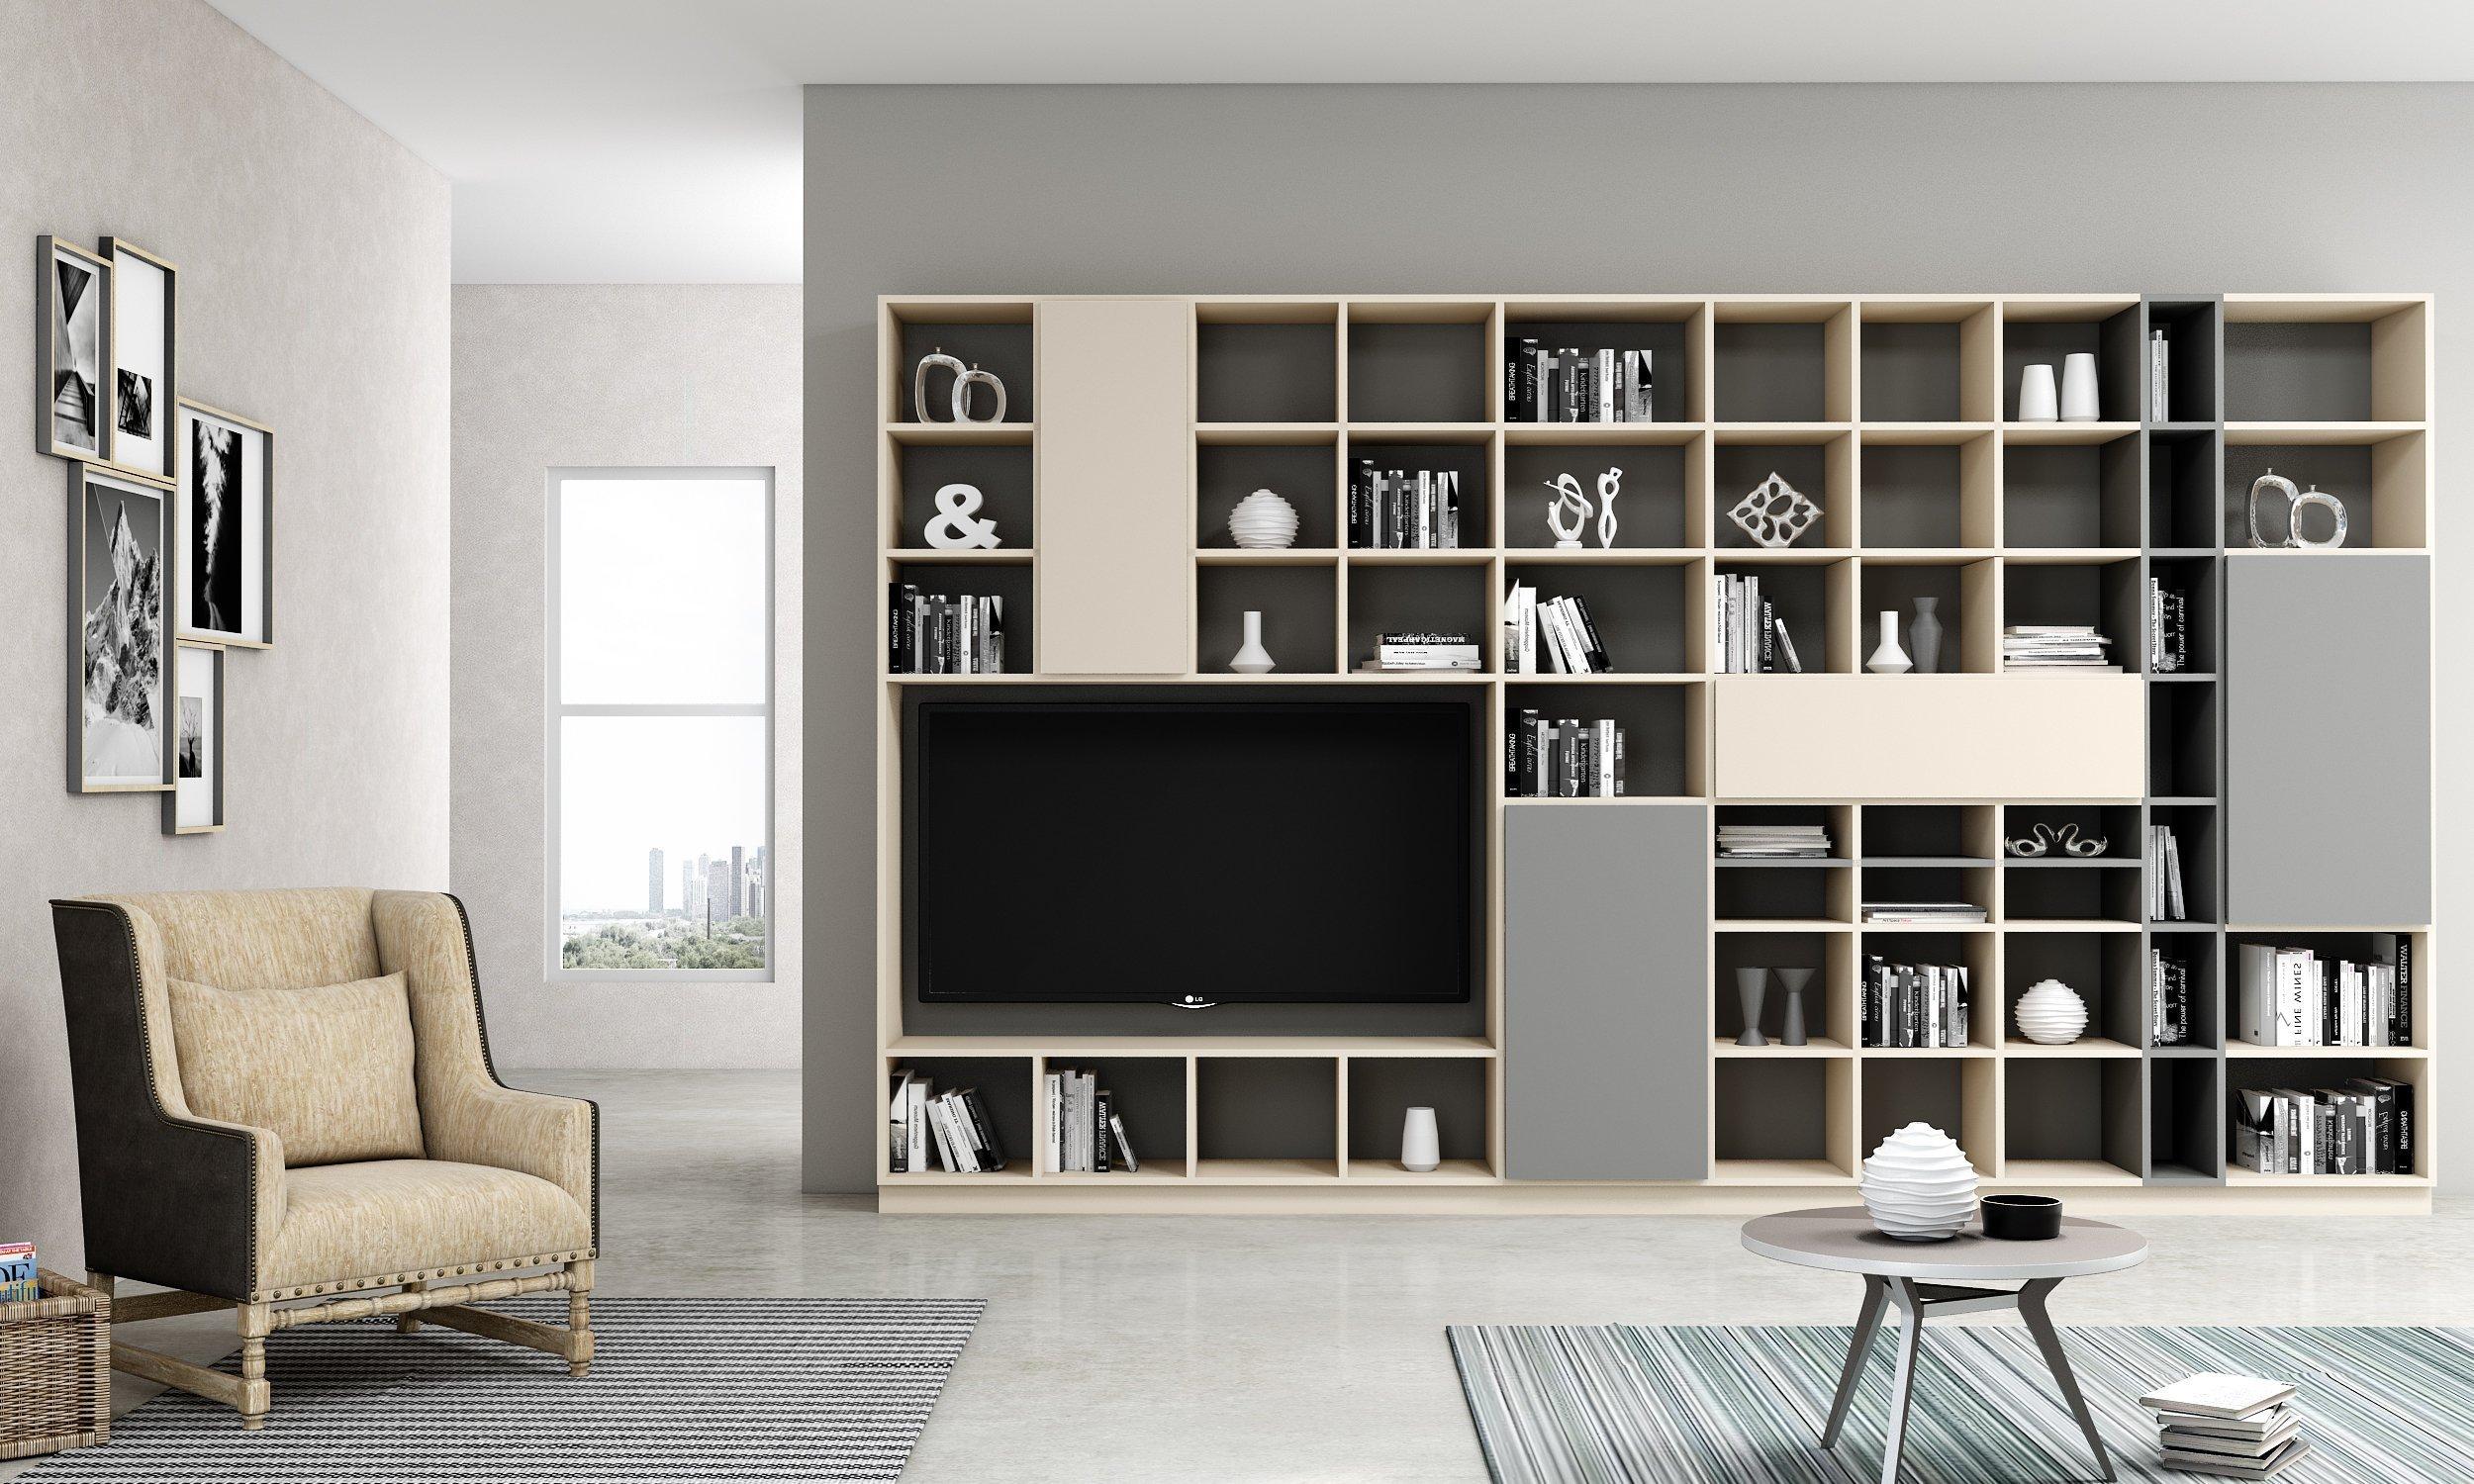 Bespoke TV storage with Book shelf in cashmere light finish (1)